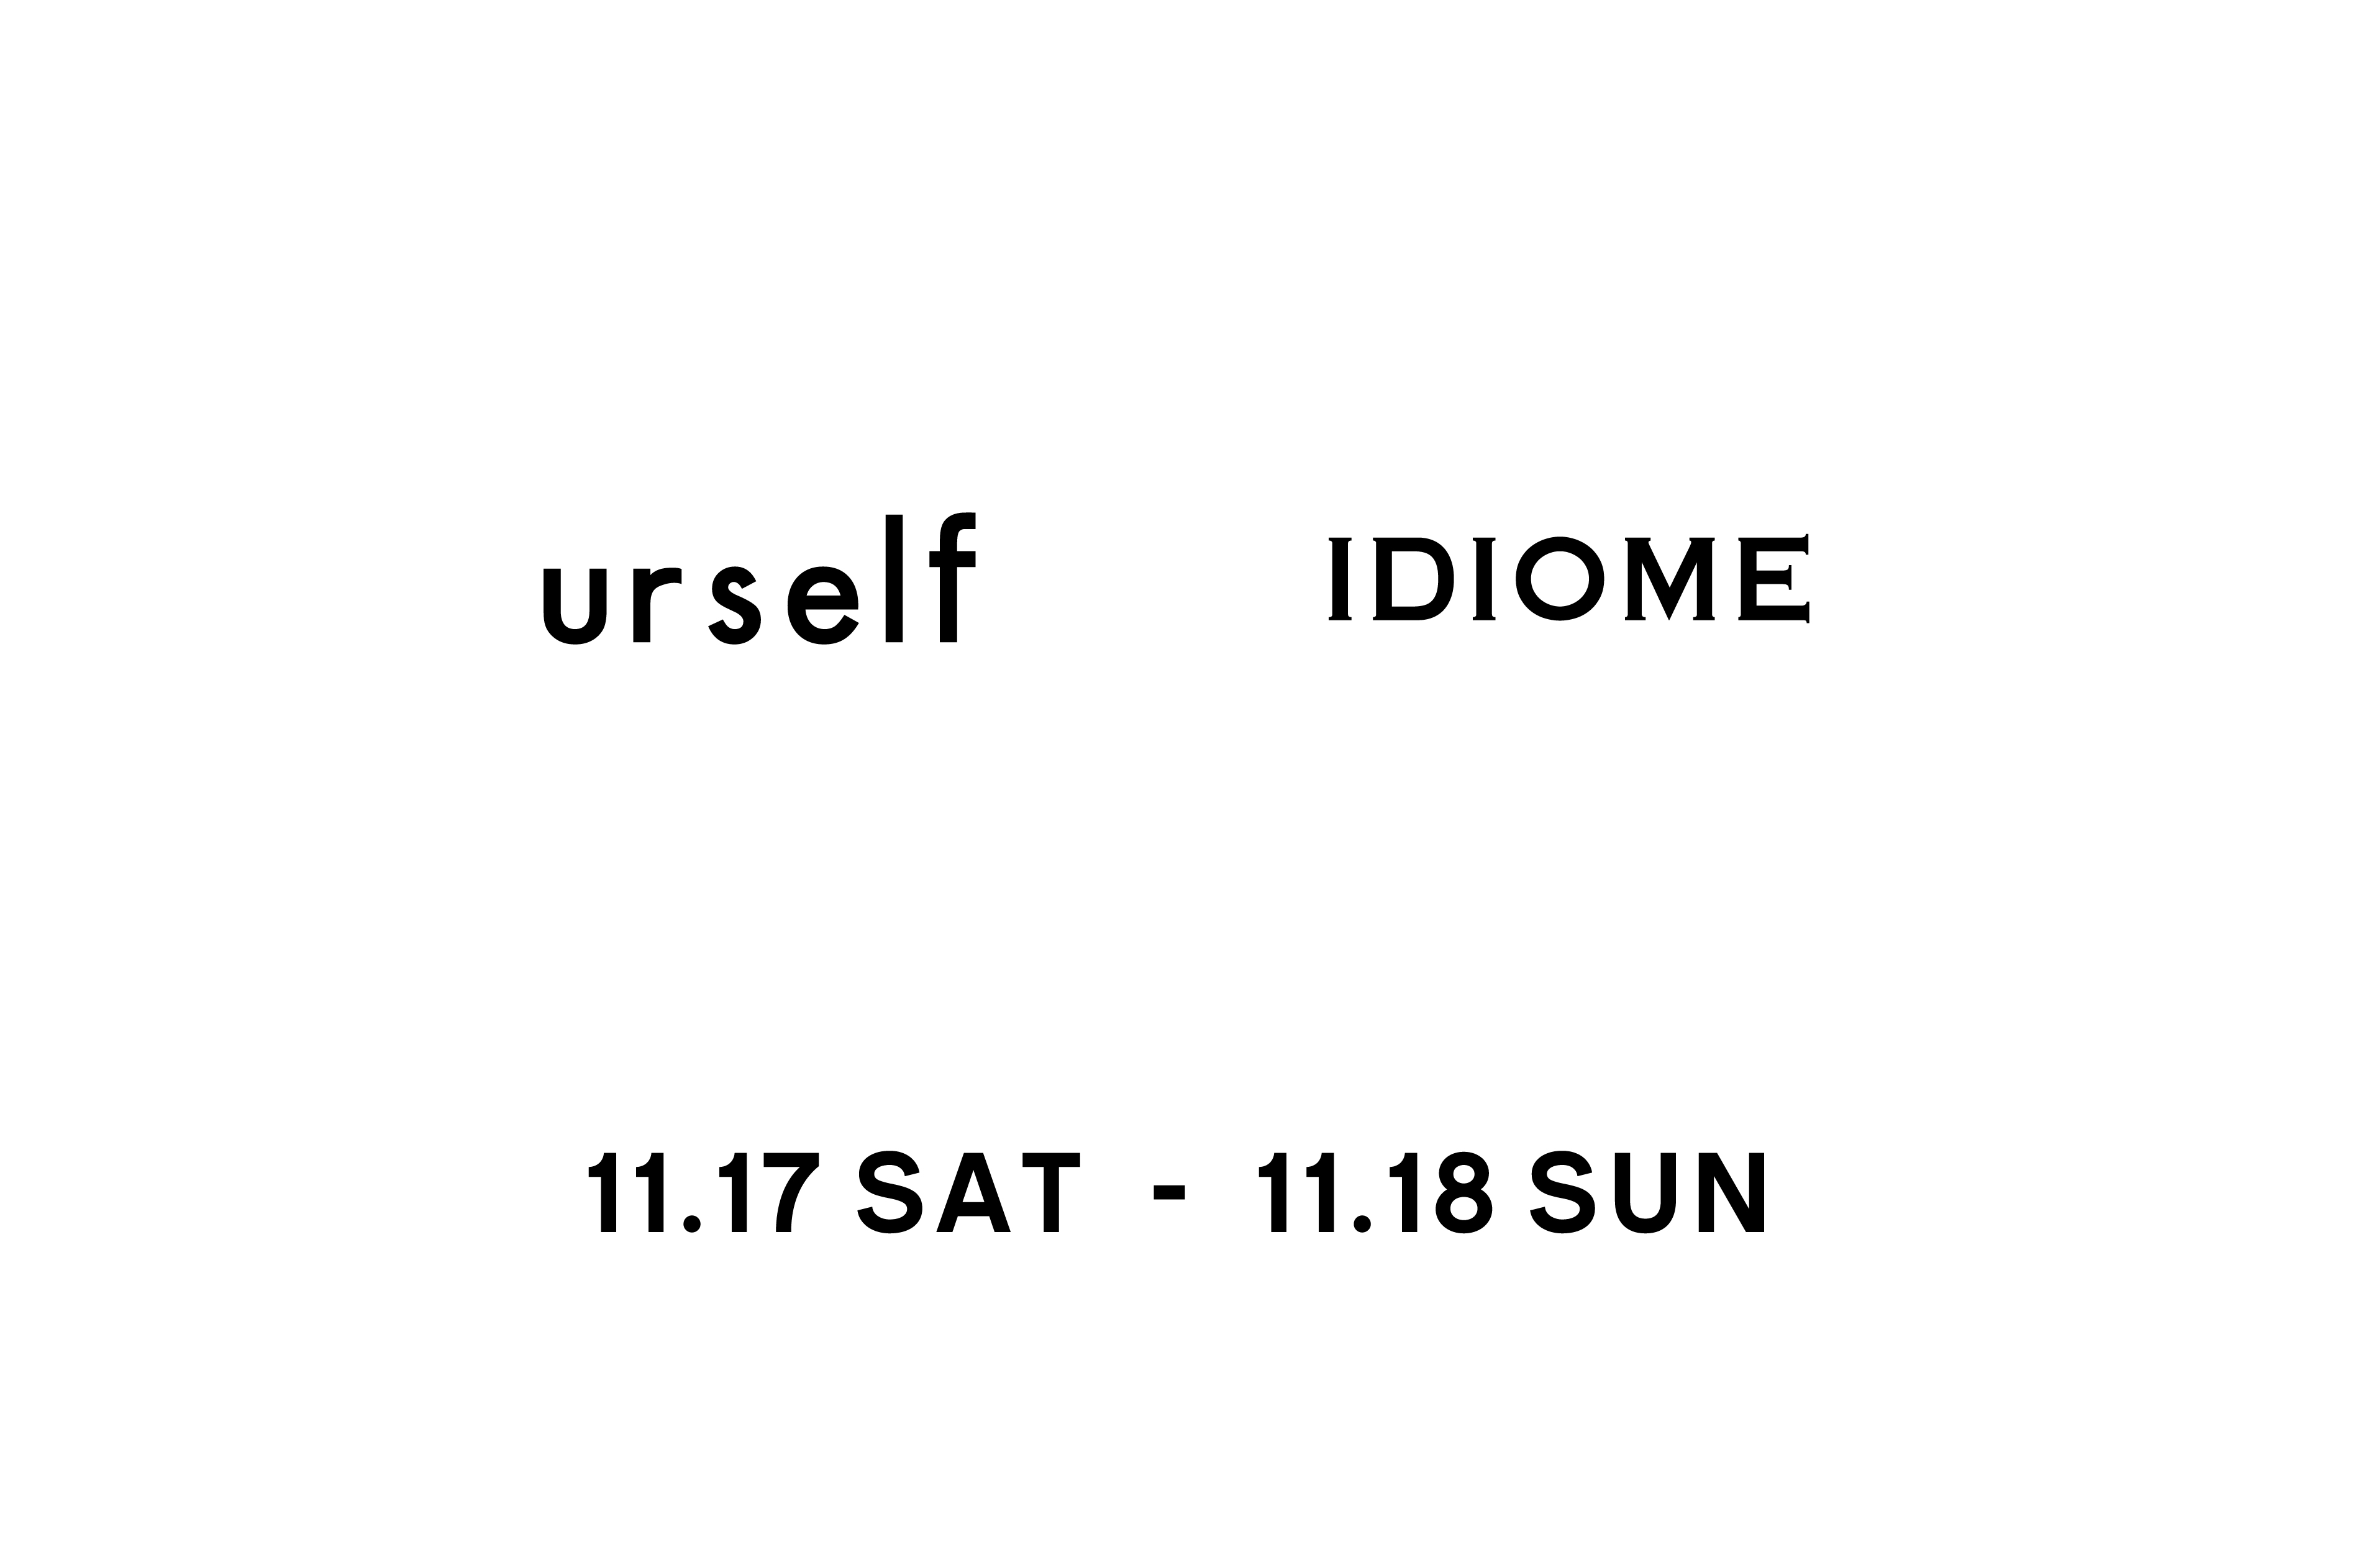 popup-idiome_20181110145837a6c.jpg